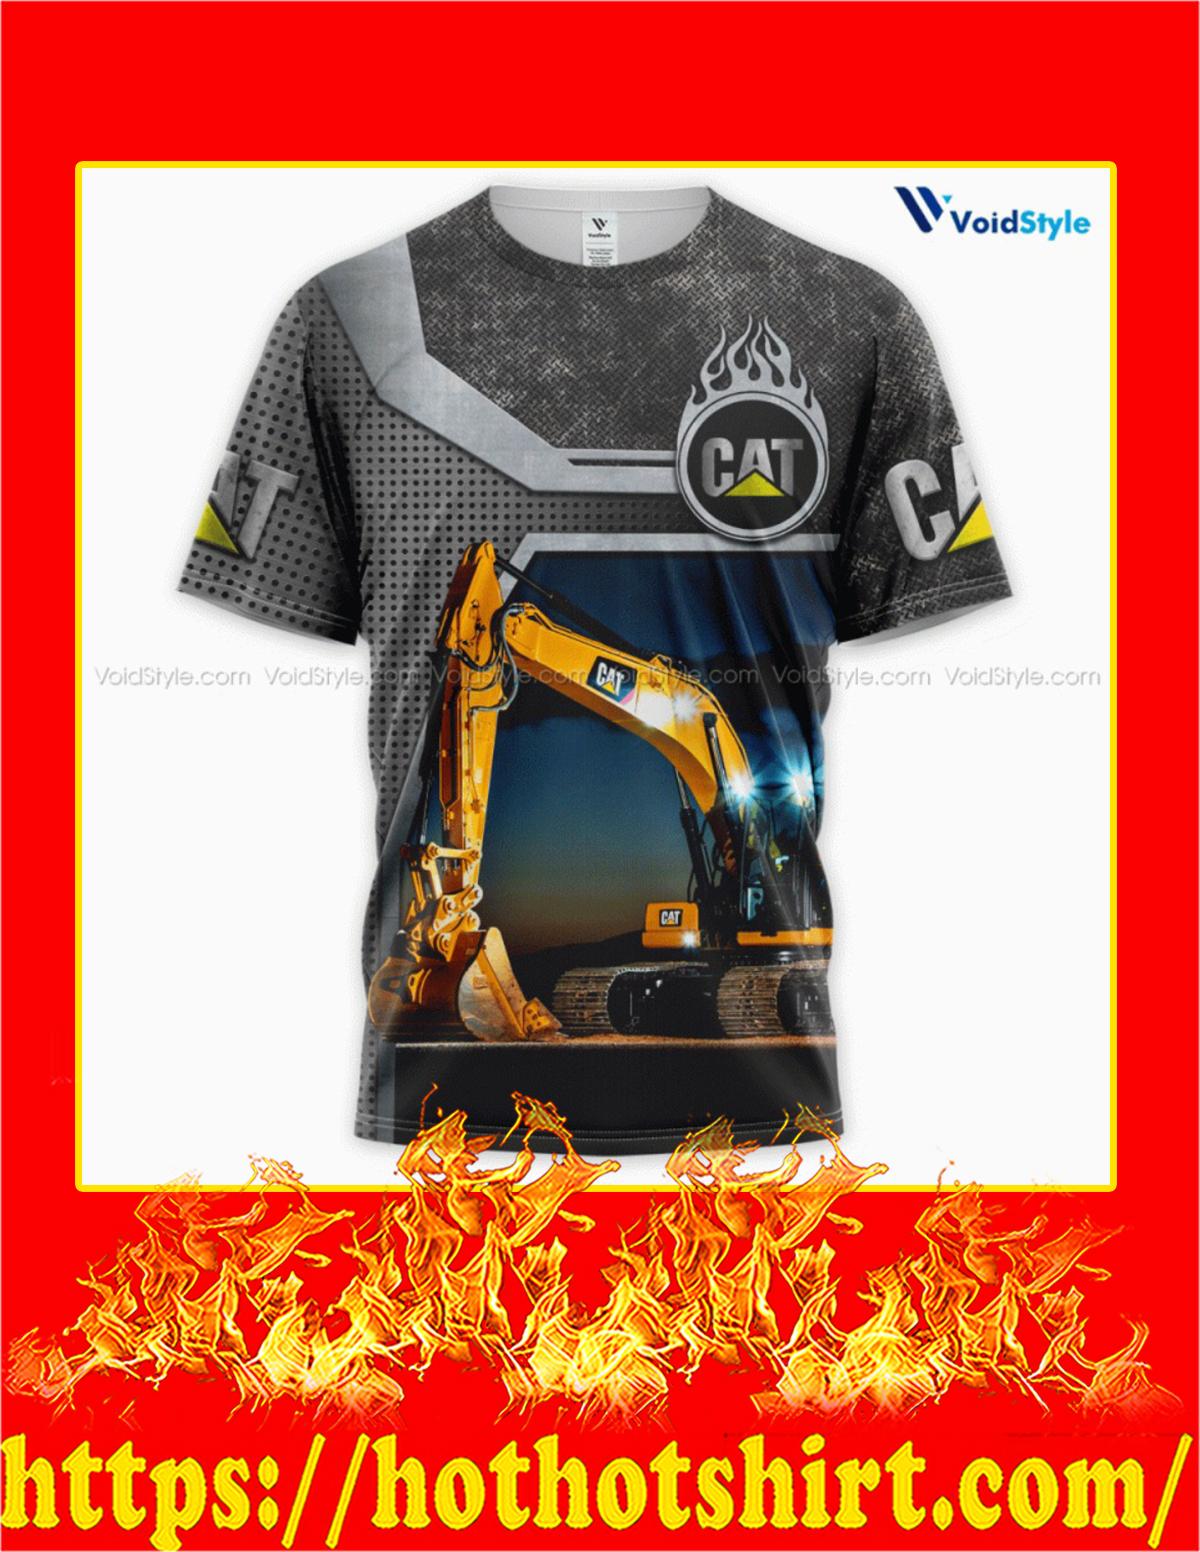 Cat Heavy Equipment 3d printed T-shirt